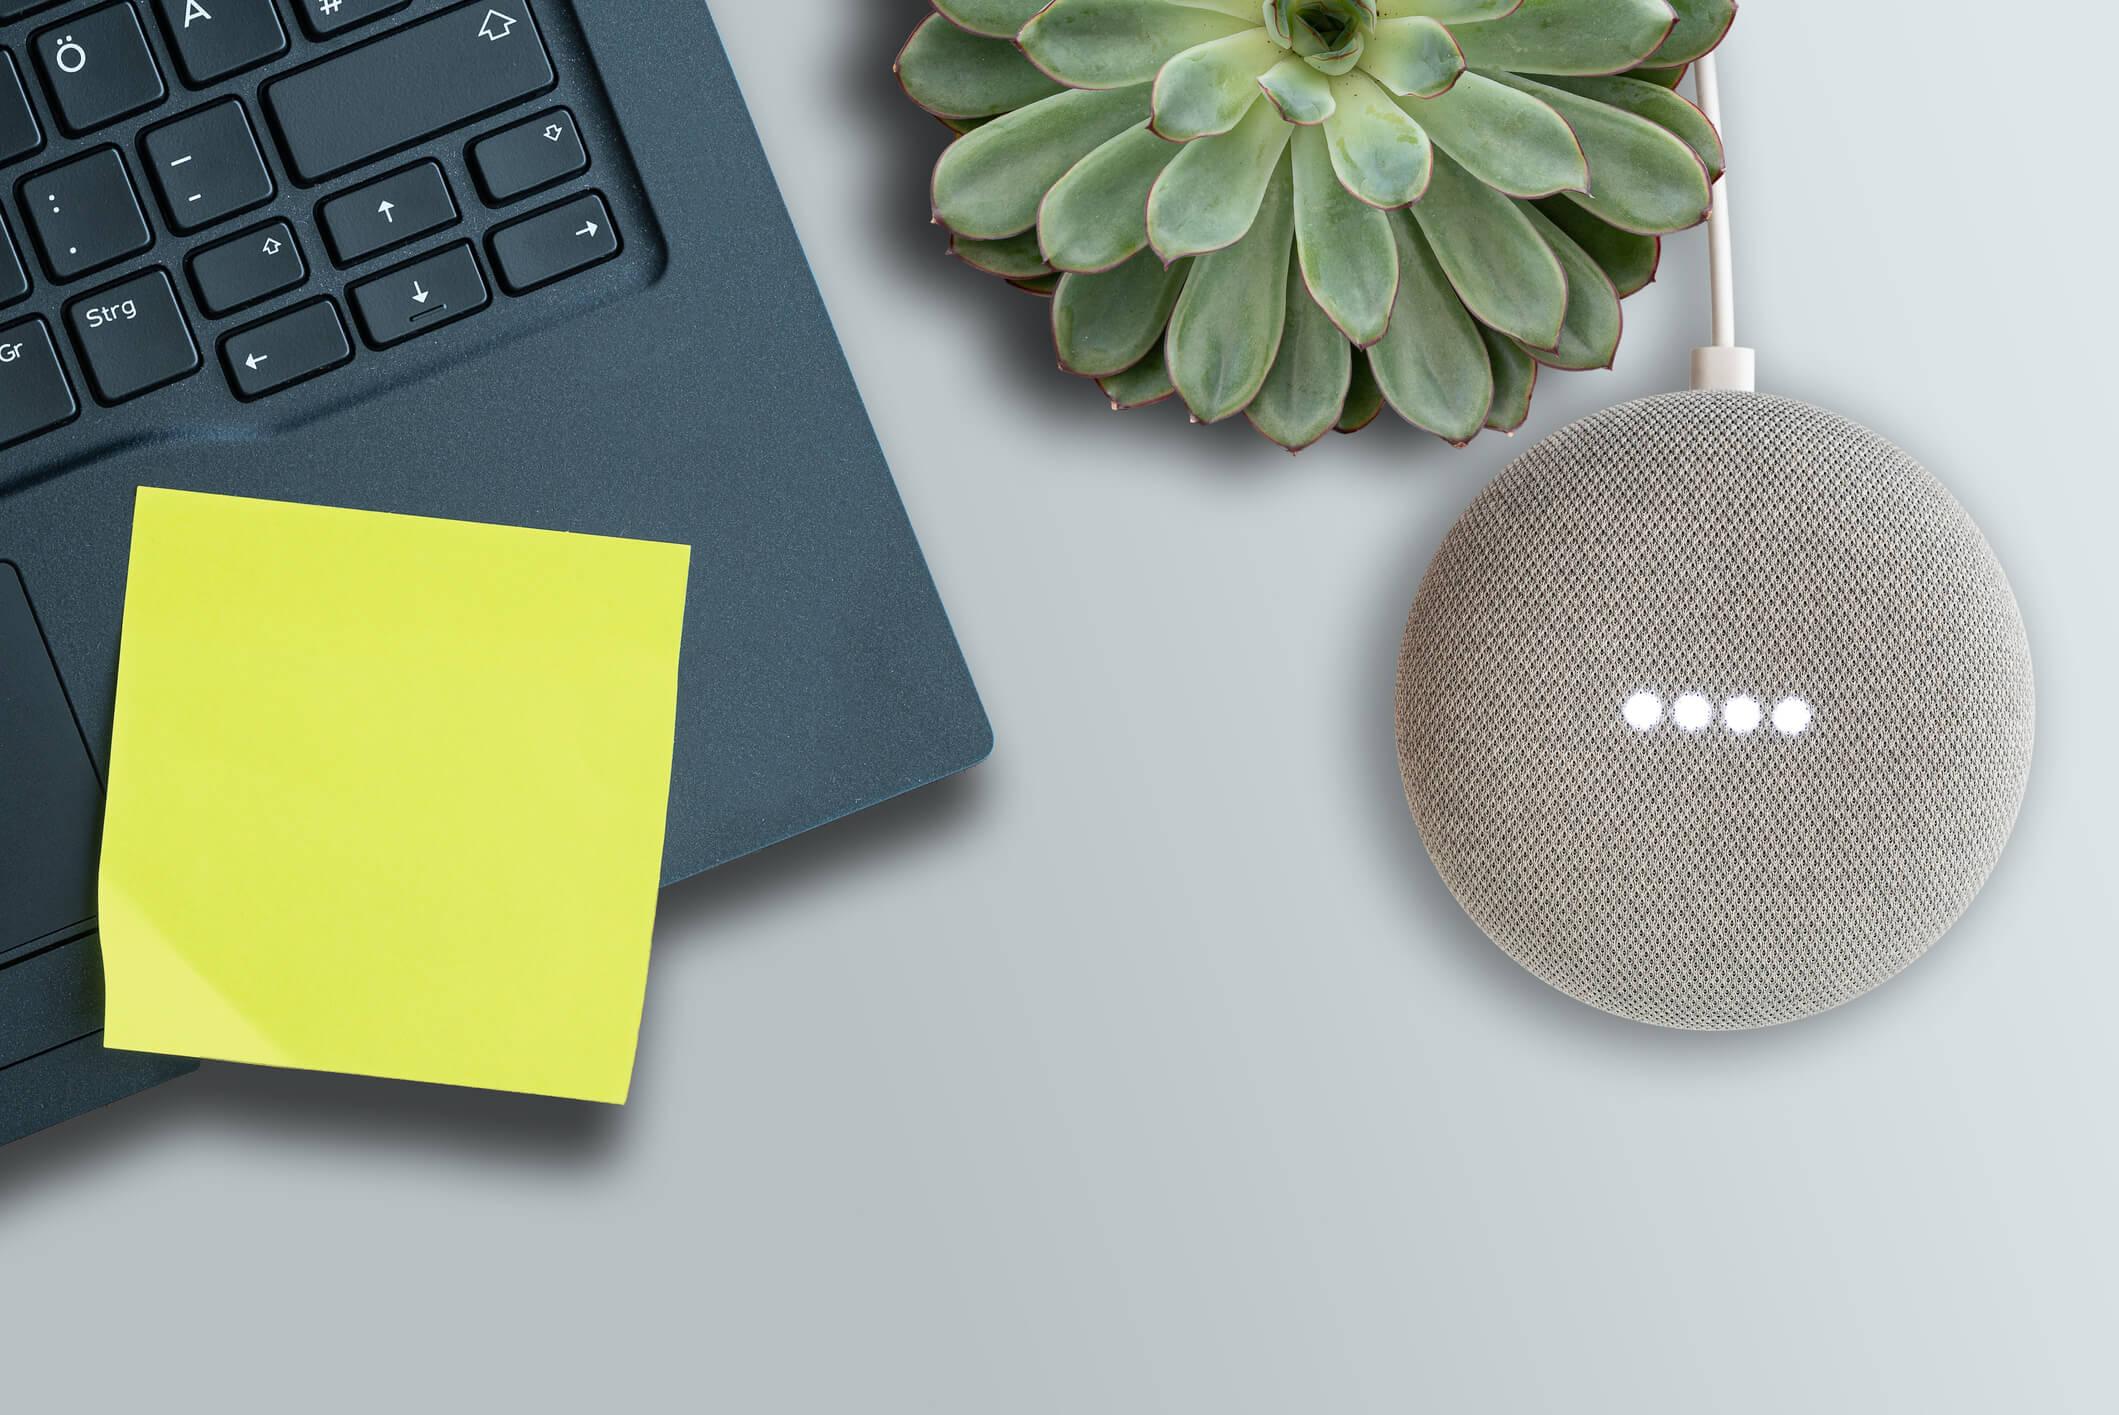 Google Home mini by a laptop